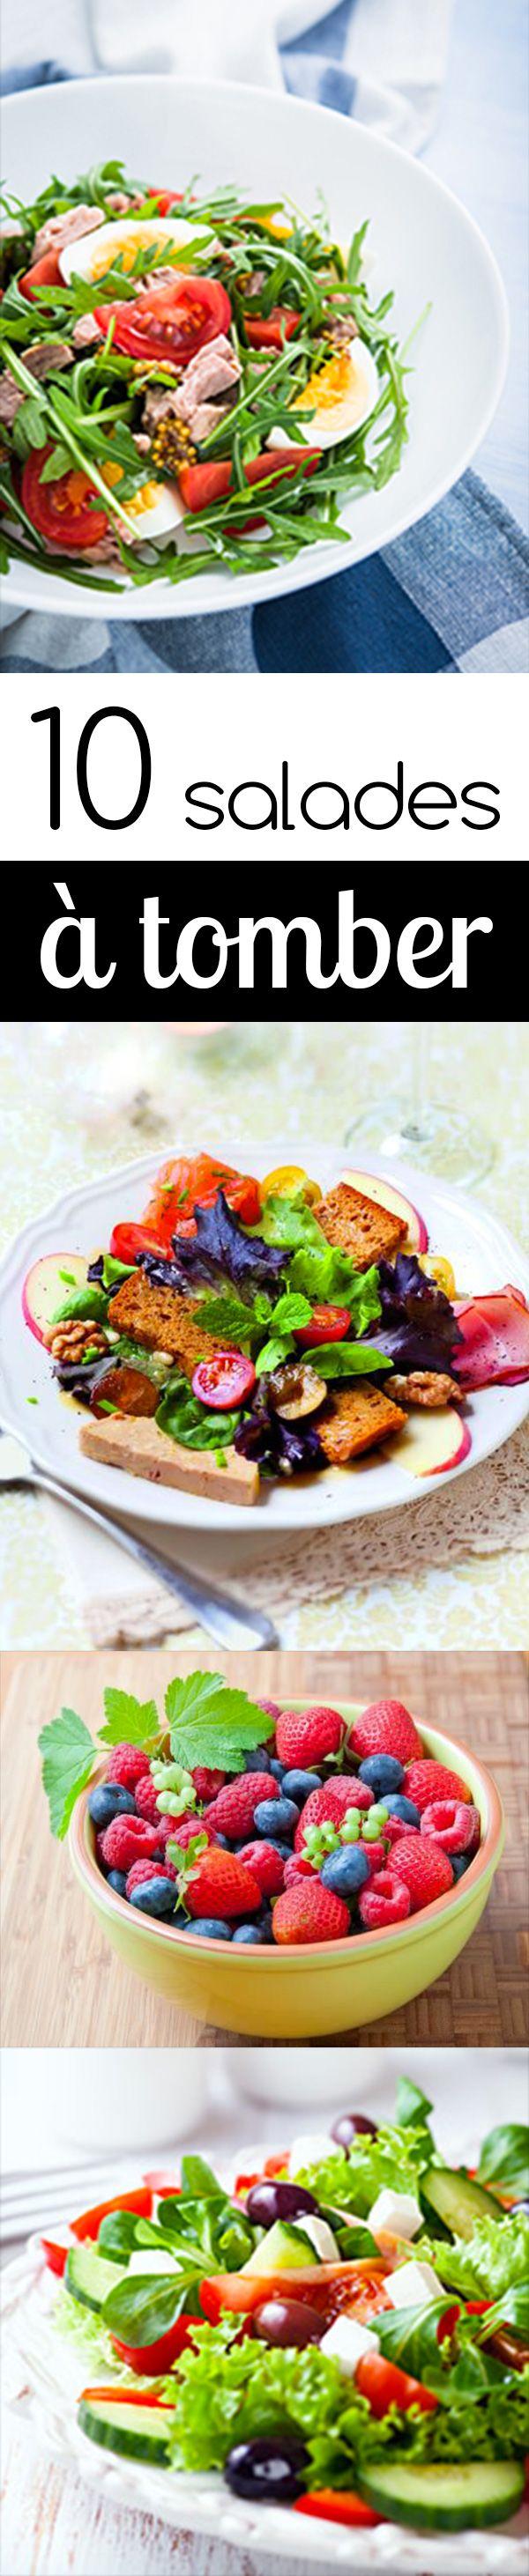 10 salades à tomber !